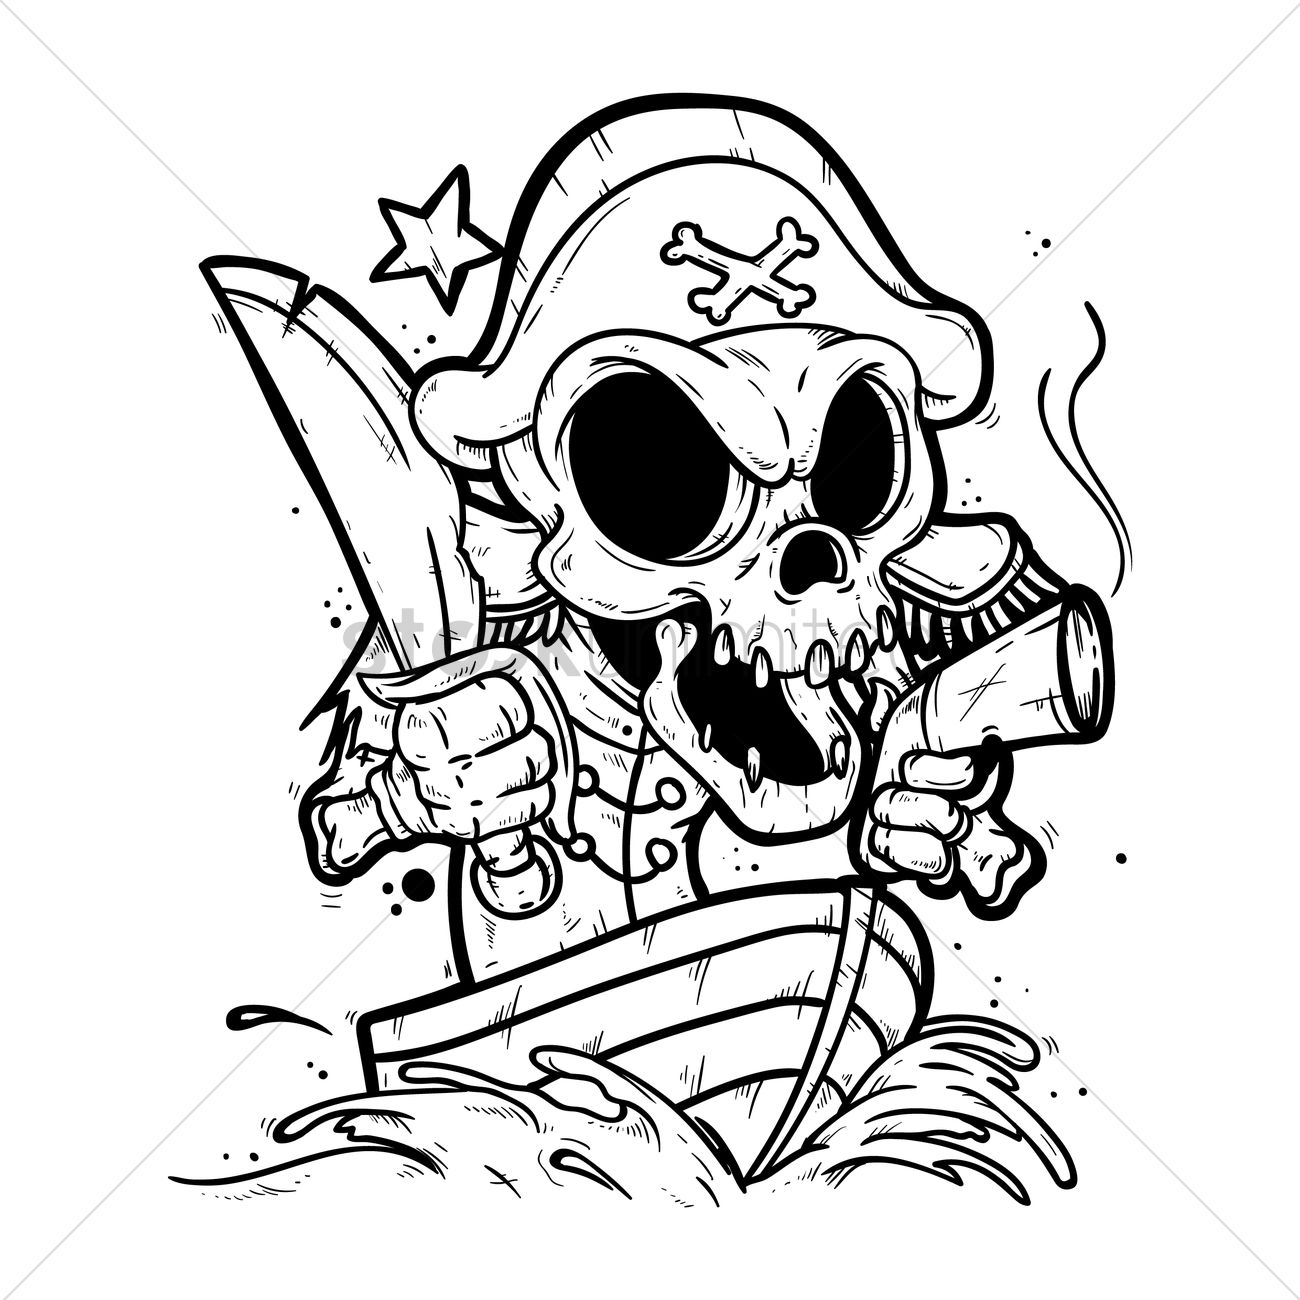 1300x1300 Pirate Skeleton Drawings Undead Skeleton Pirate Drawings